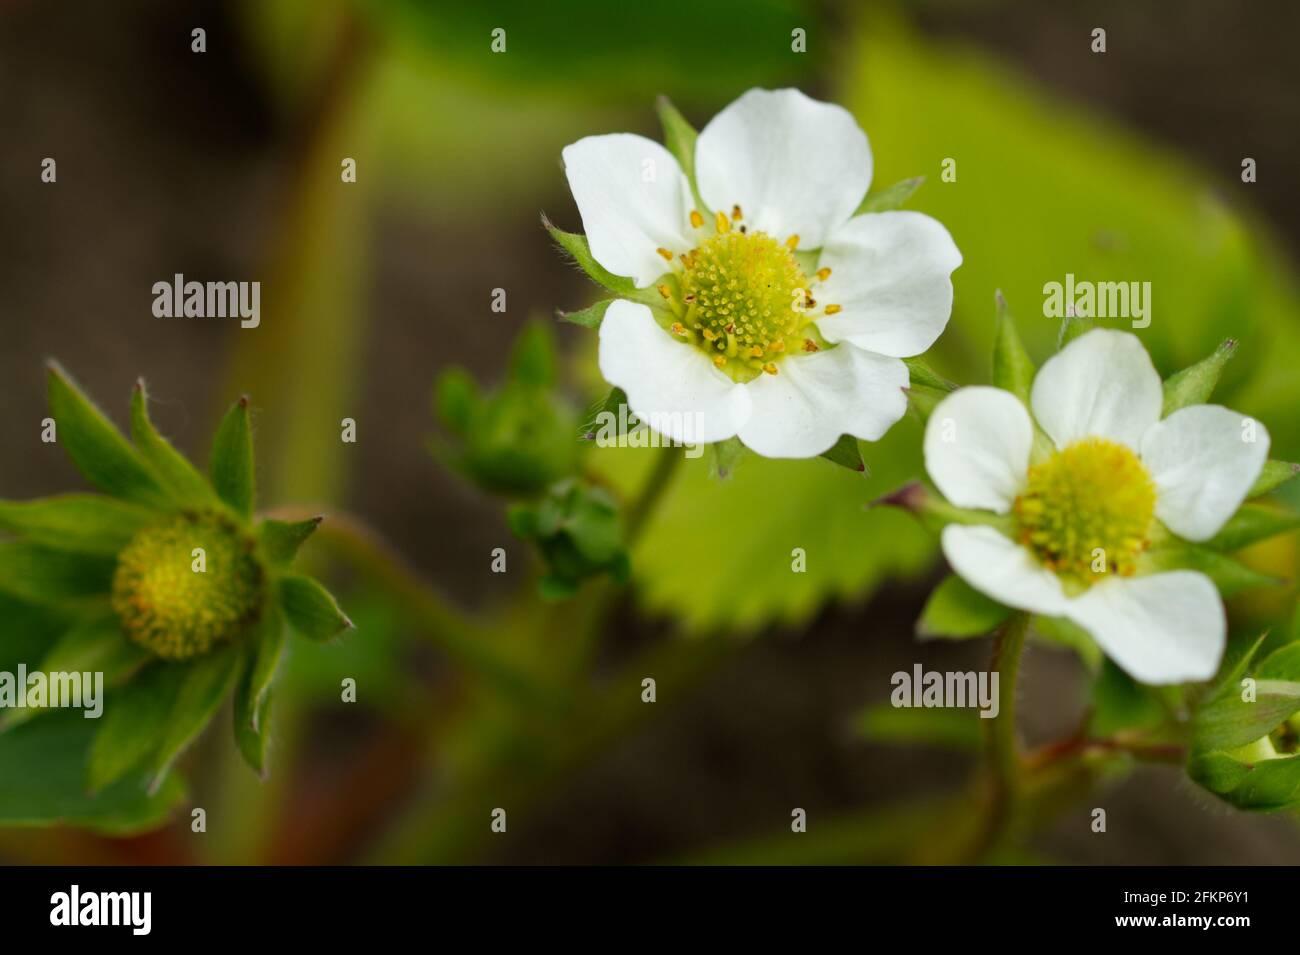 Fragaria × ananassa, strawberry plant flowers in spring UK Stock Photo